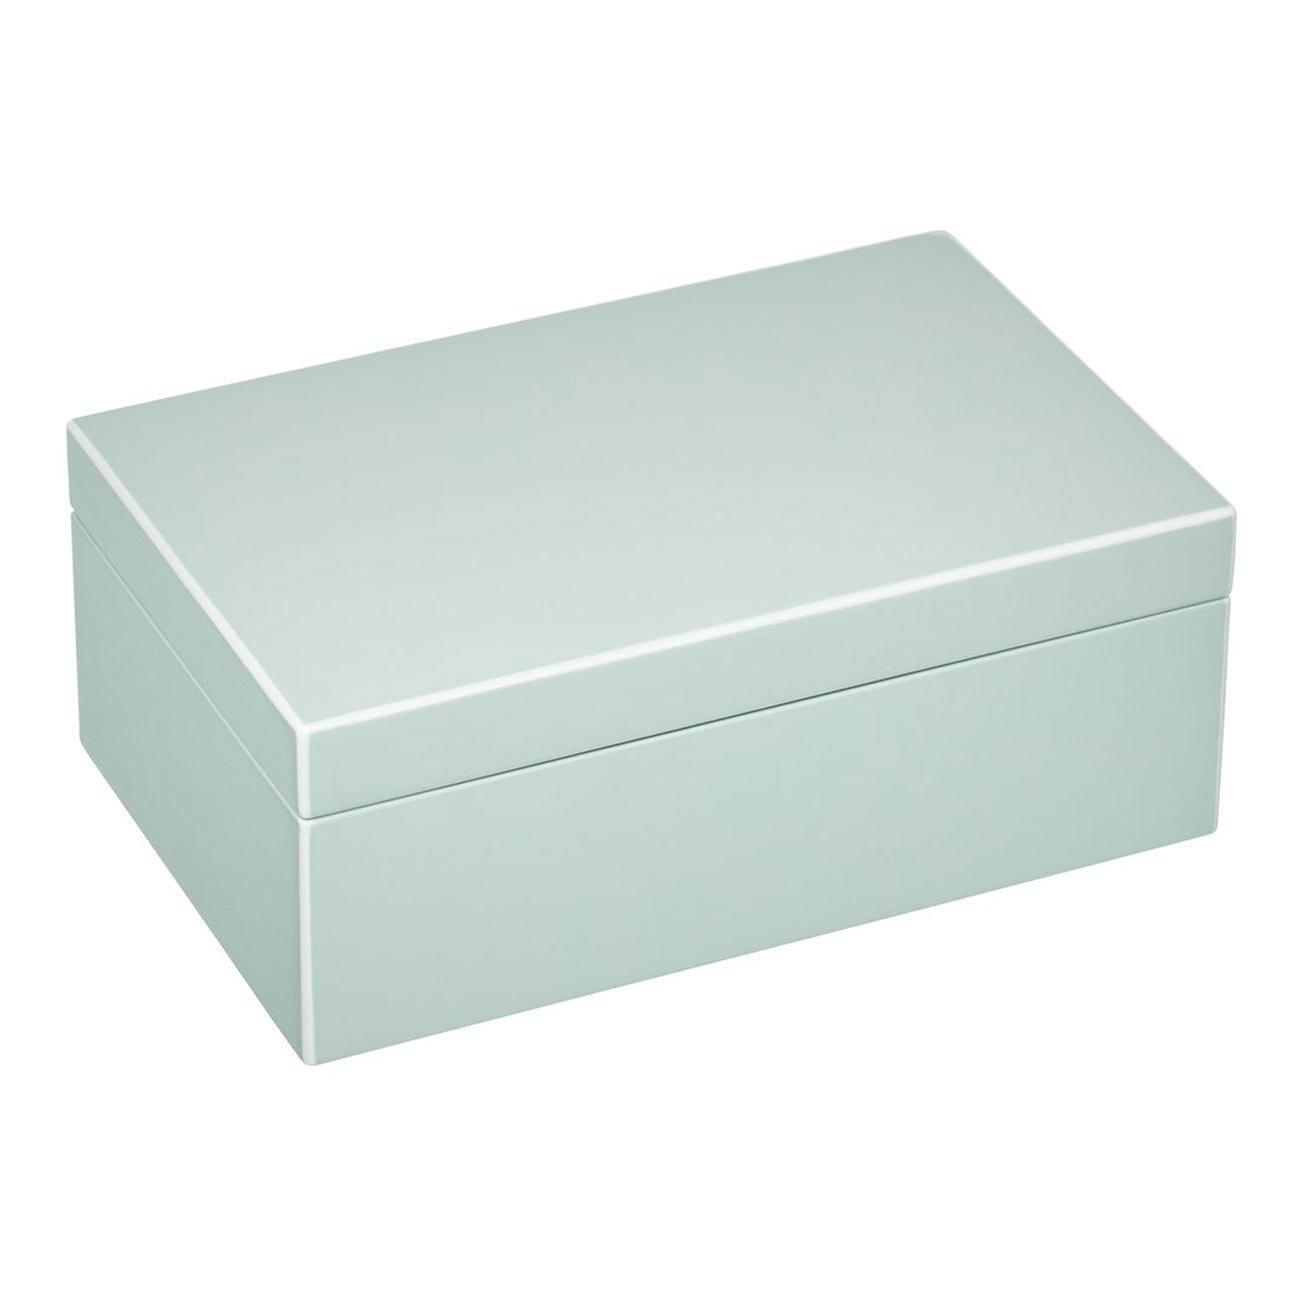 Giftcompany Tang, Schmuckbox, S, sage, MDF, sage, 22x14x8,3cm